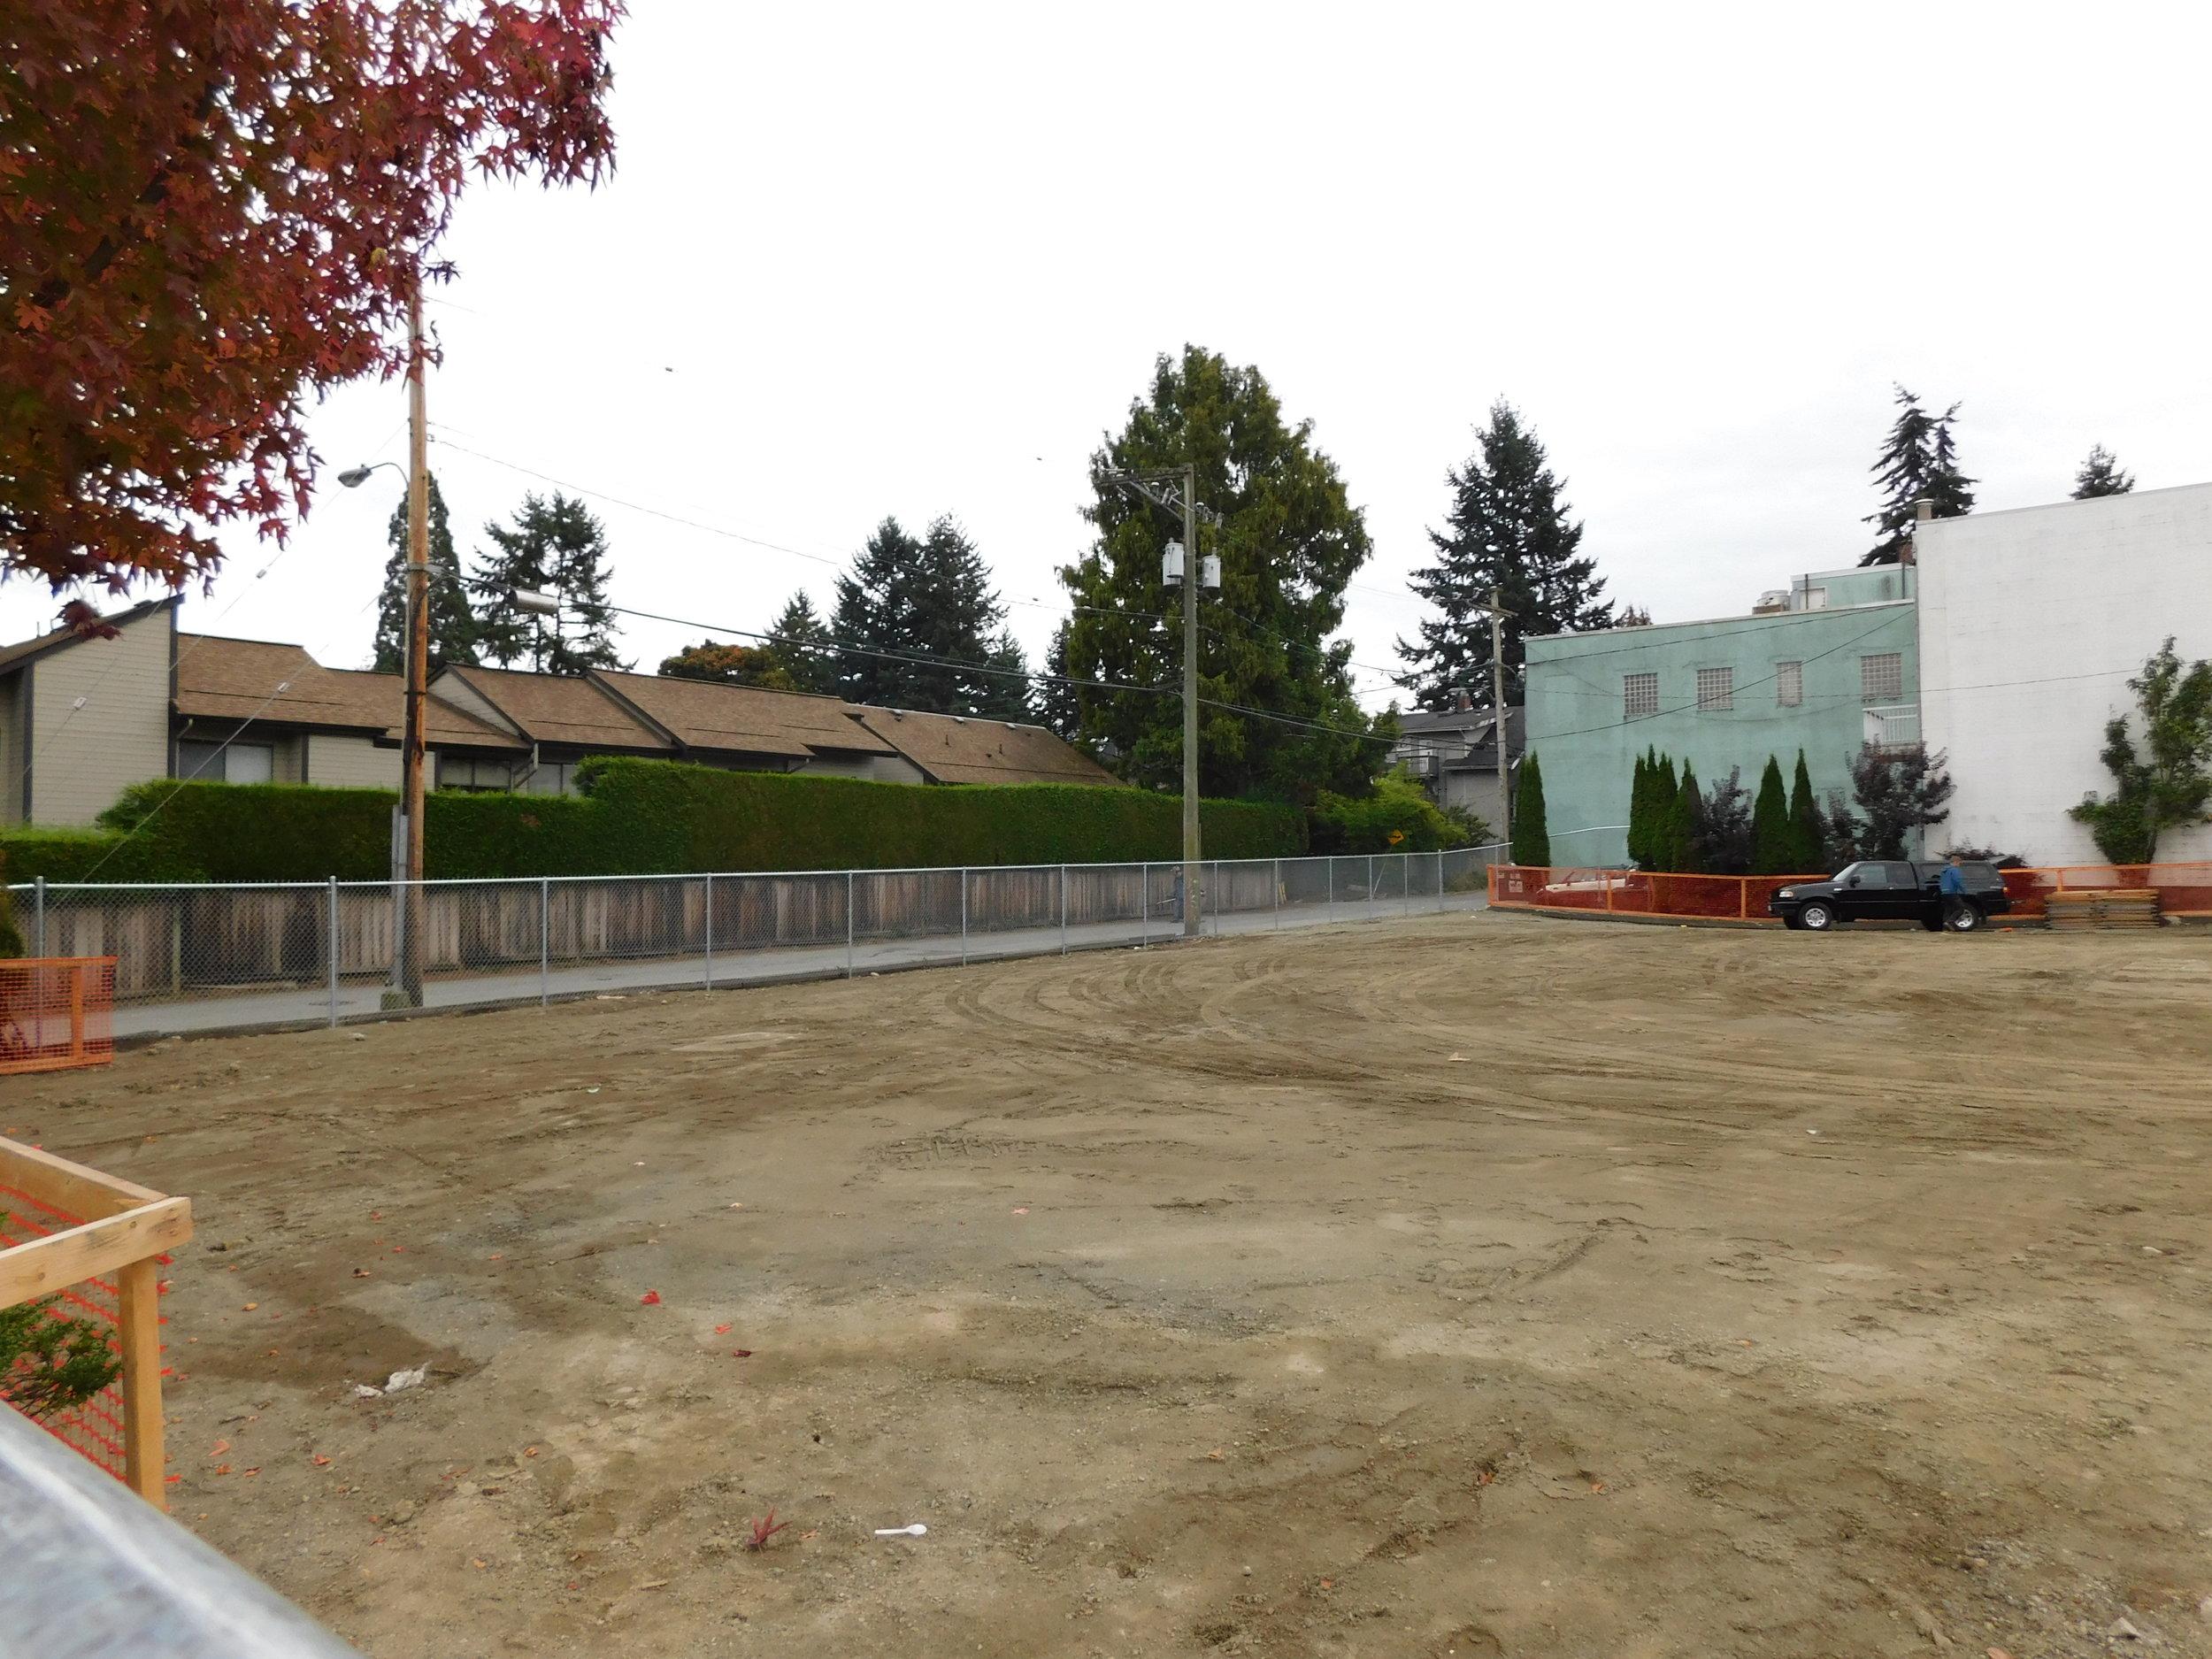 community_garden_vacant_grow_vancouver-0023.JPG